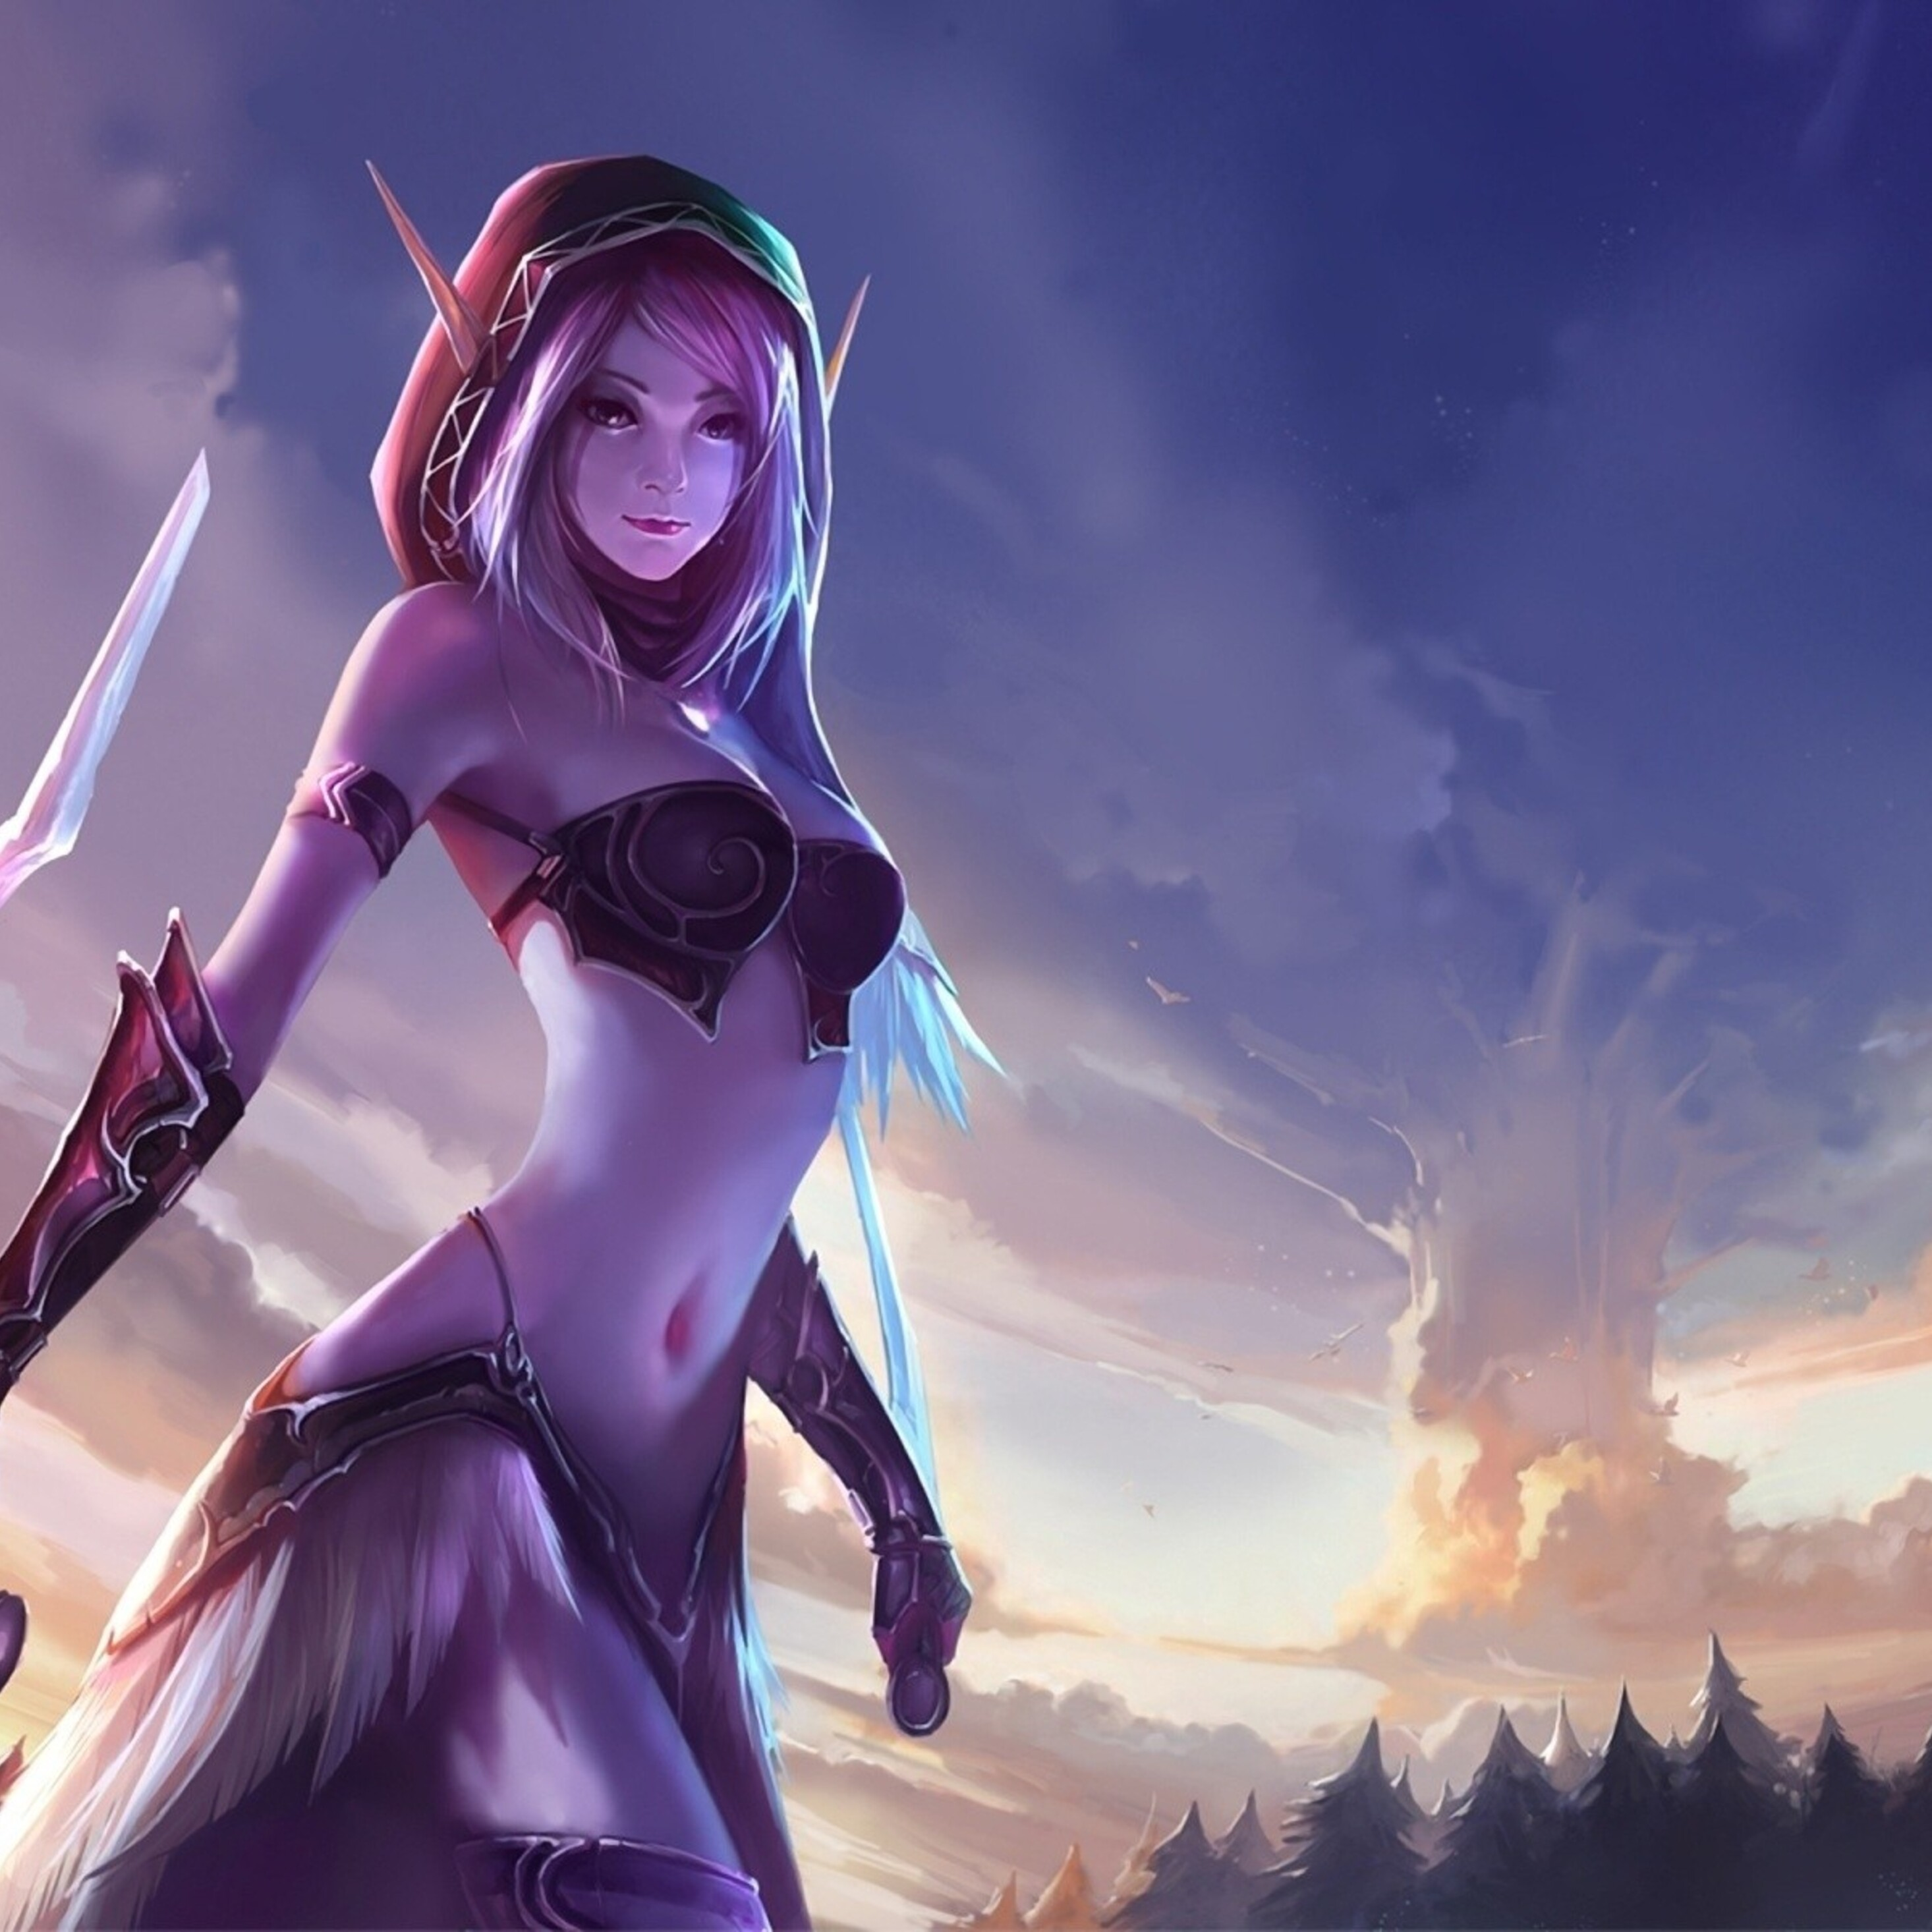 2932x2932 World Of Warcraft Anime Girl Ipad Pro Retina